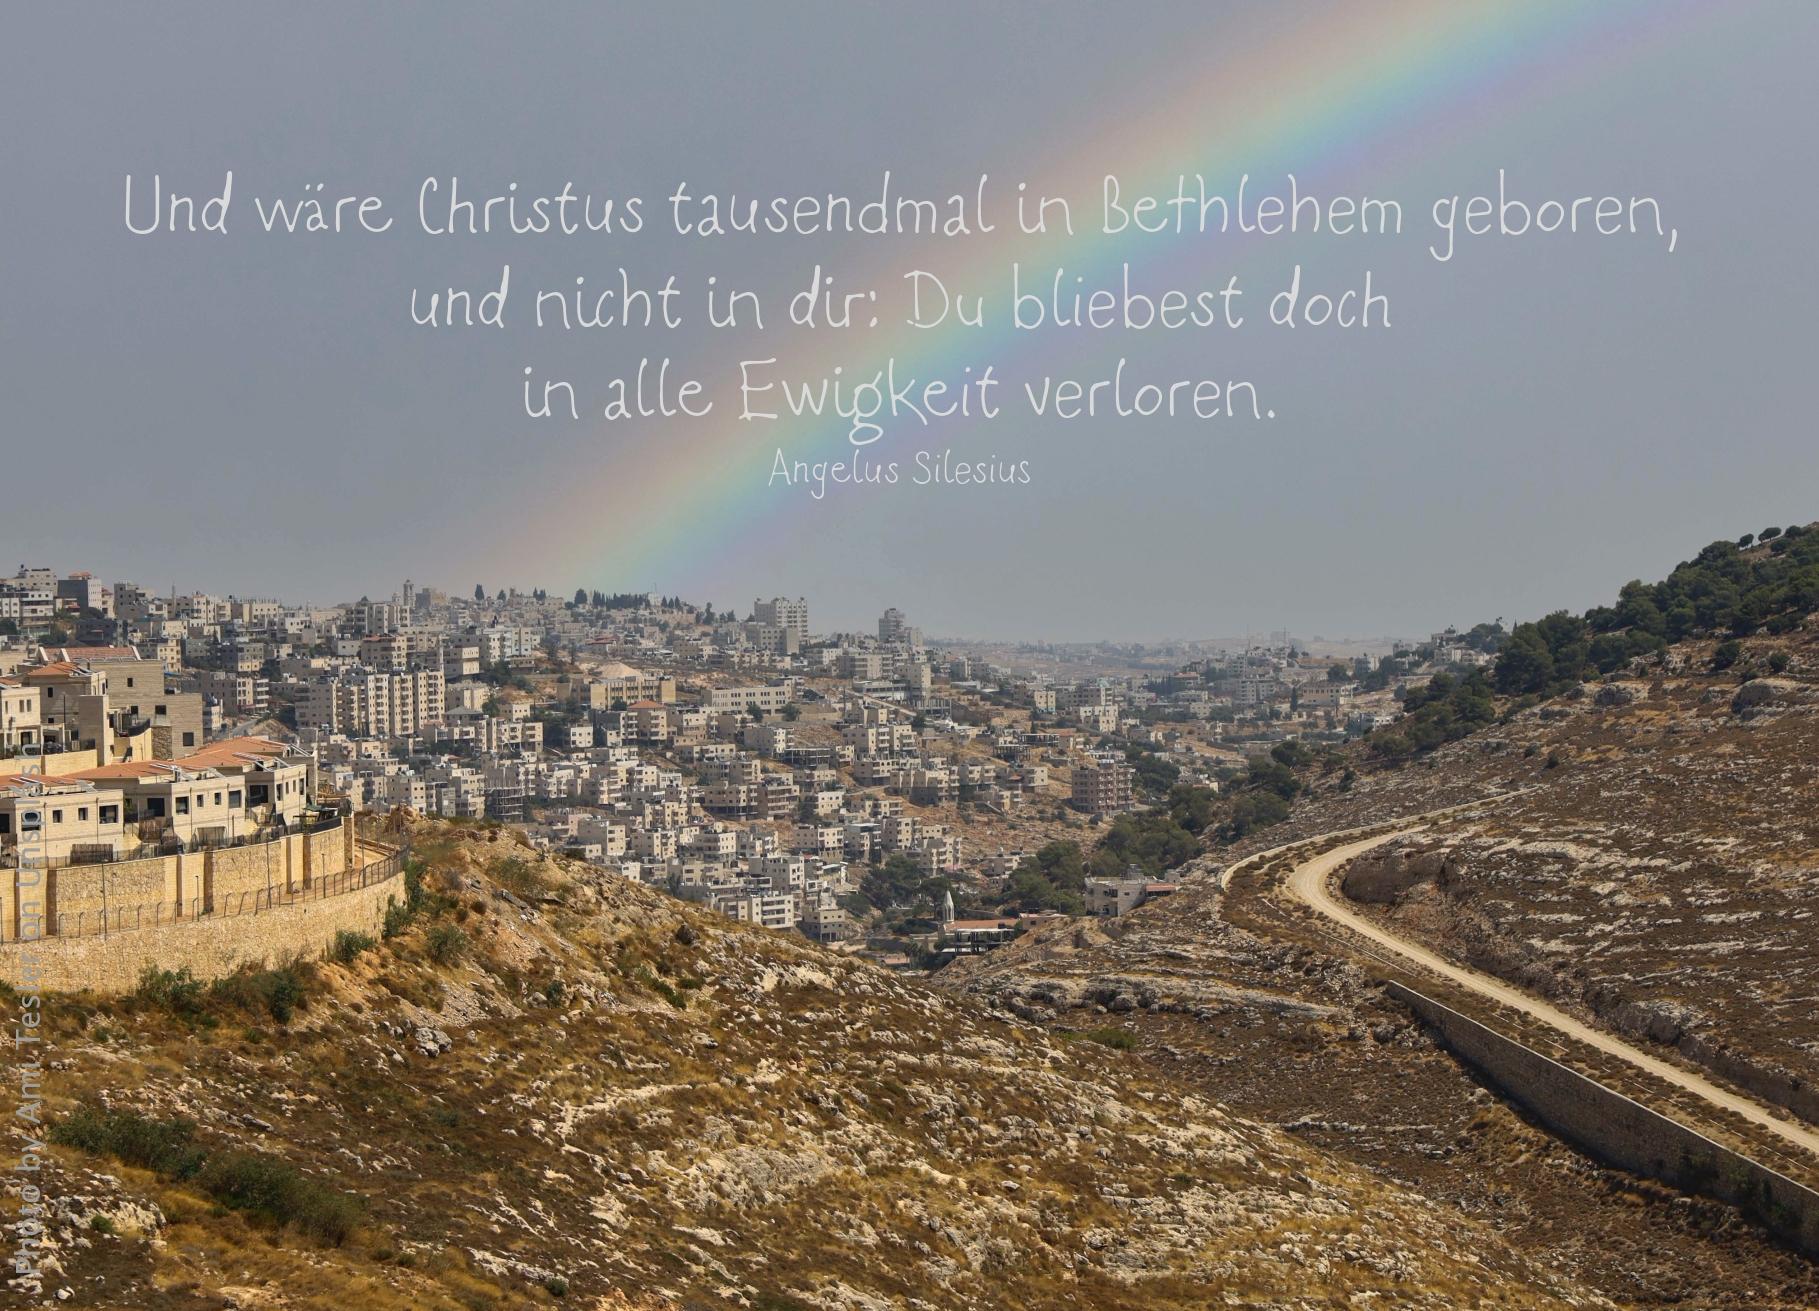 "alt=""regenbogen_ueber_bethlehem_erwartet_bibelhoerbuch_visionen_von_amos"""